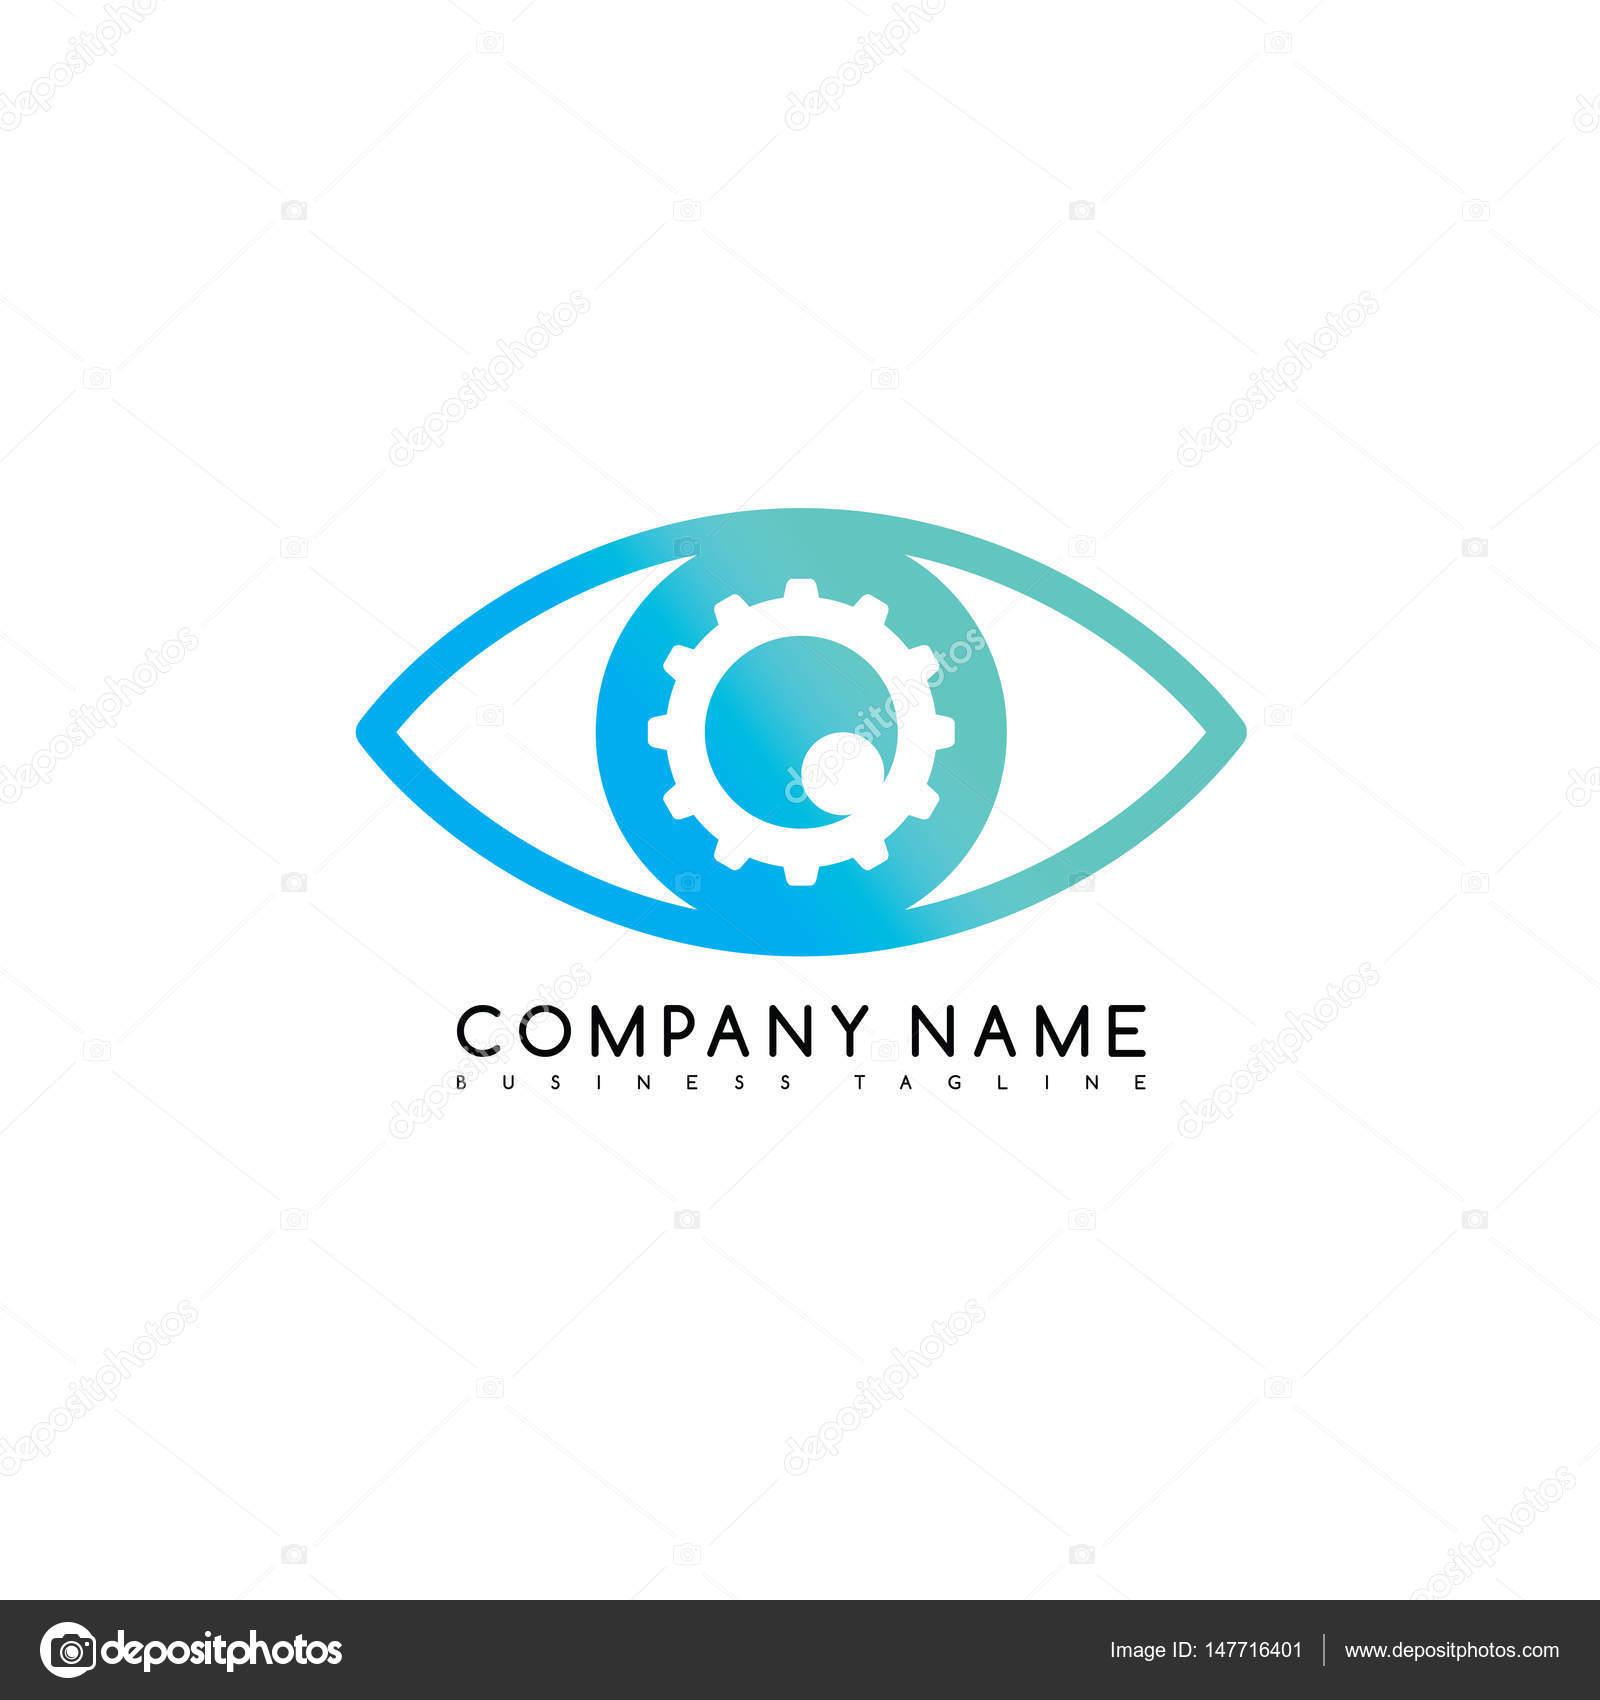 Company name business tagline stock vector vectorfirst 147716401 company name business tagline stock vector 147716401 buycottarizona